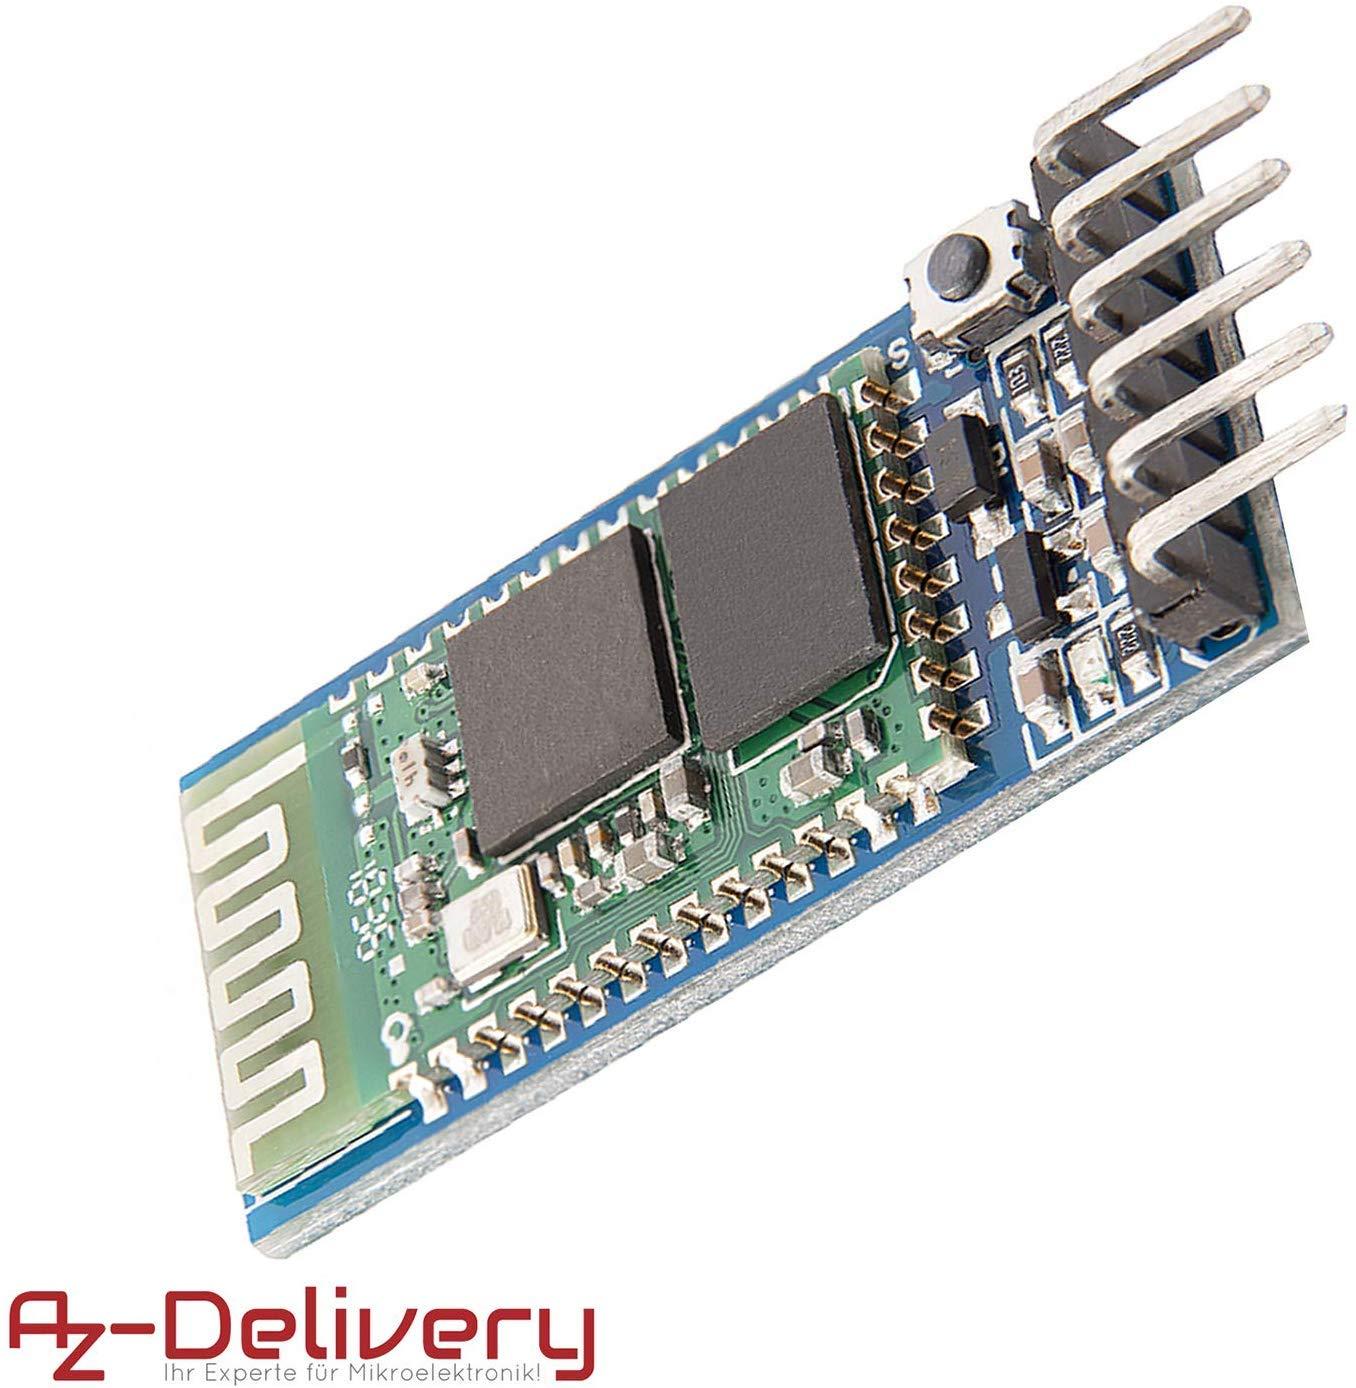 AZDelivery HC de 05 Bluetooth Wireless RF Modulo transceptor RS232 TTL de serie y HC de 06 inalámbrica Bluetooth Serial Transceiver módulo esclavo Comunicación Serial para Arduino con eBook incluido